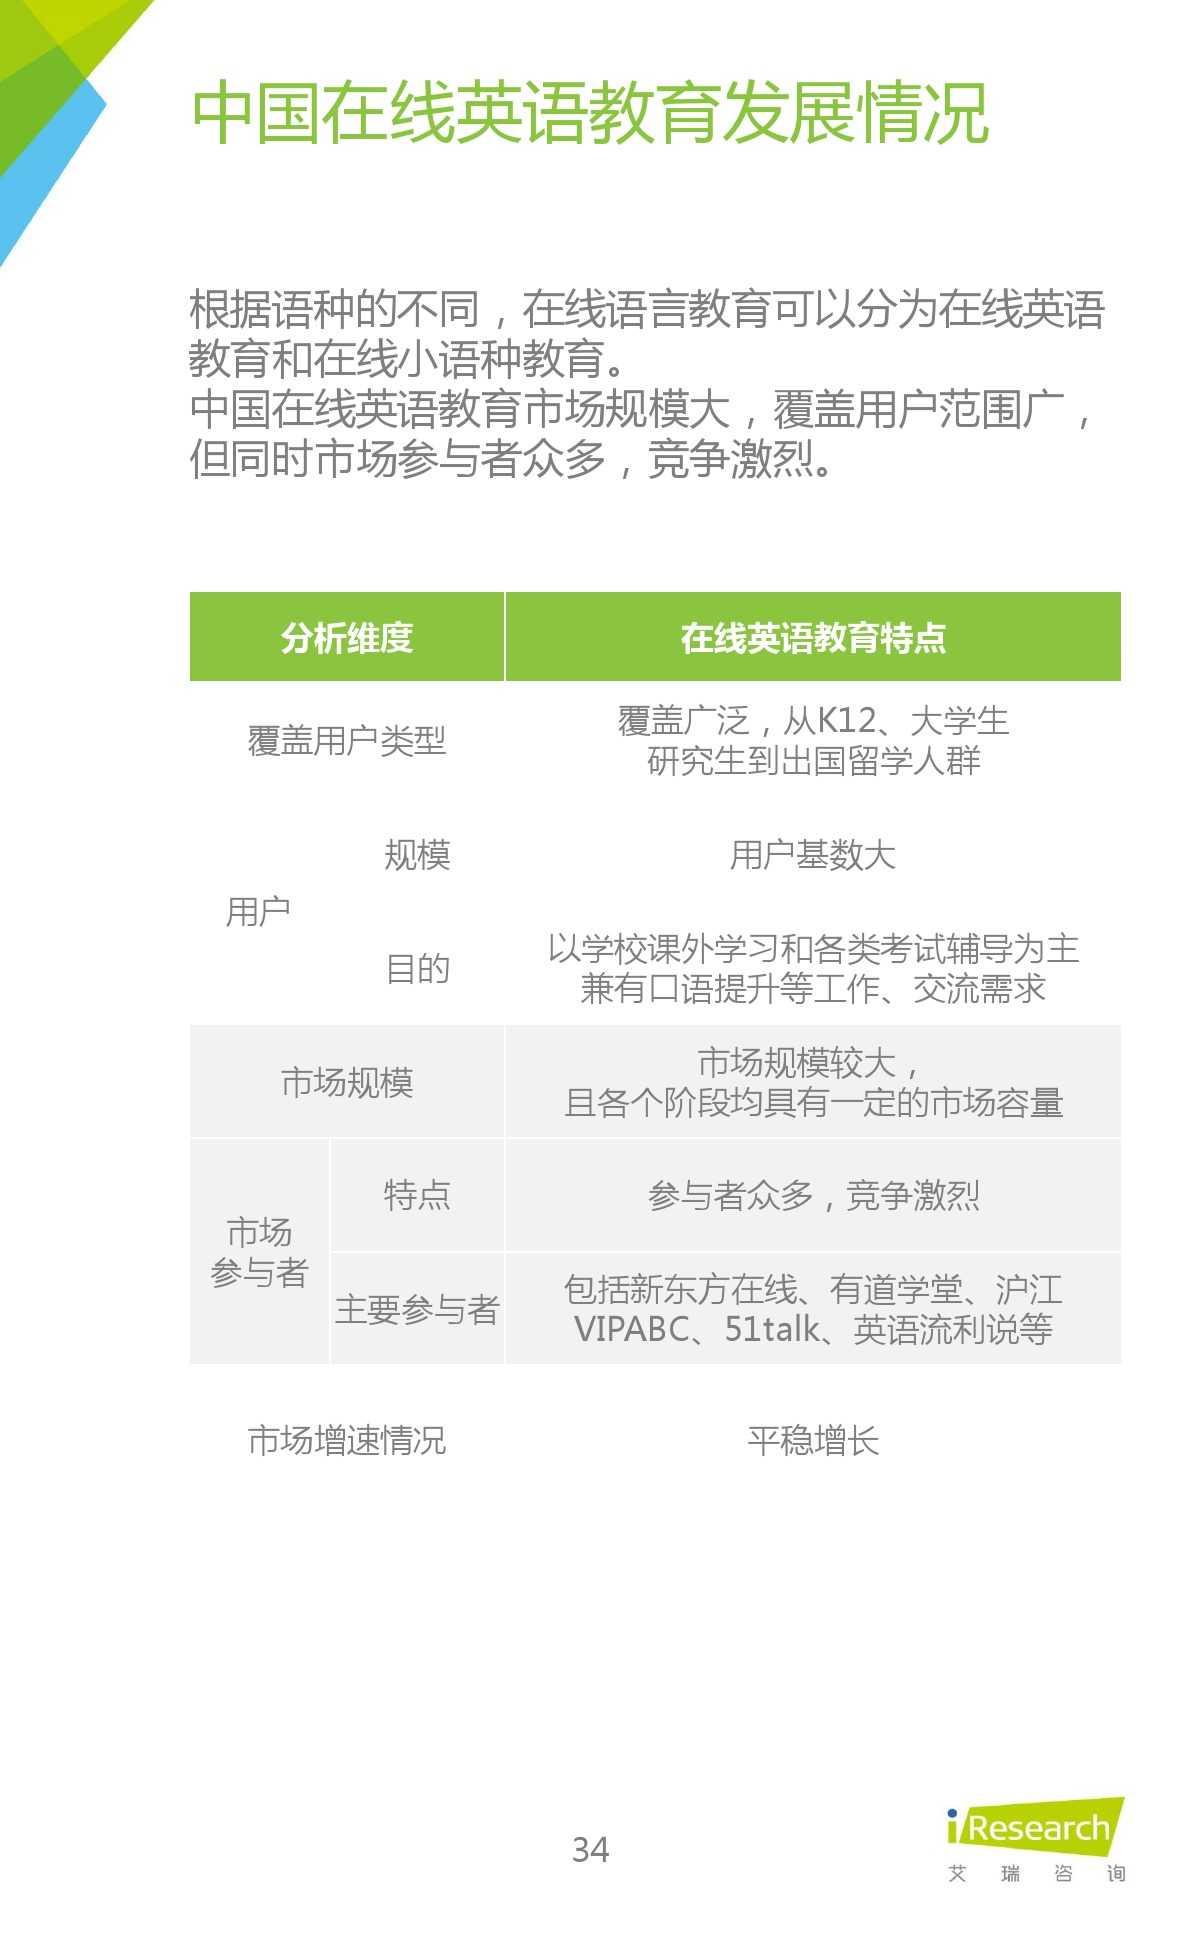 iResearch-2015年中国在线教育平台研究报告_000034